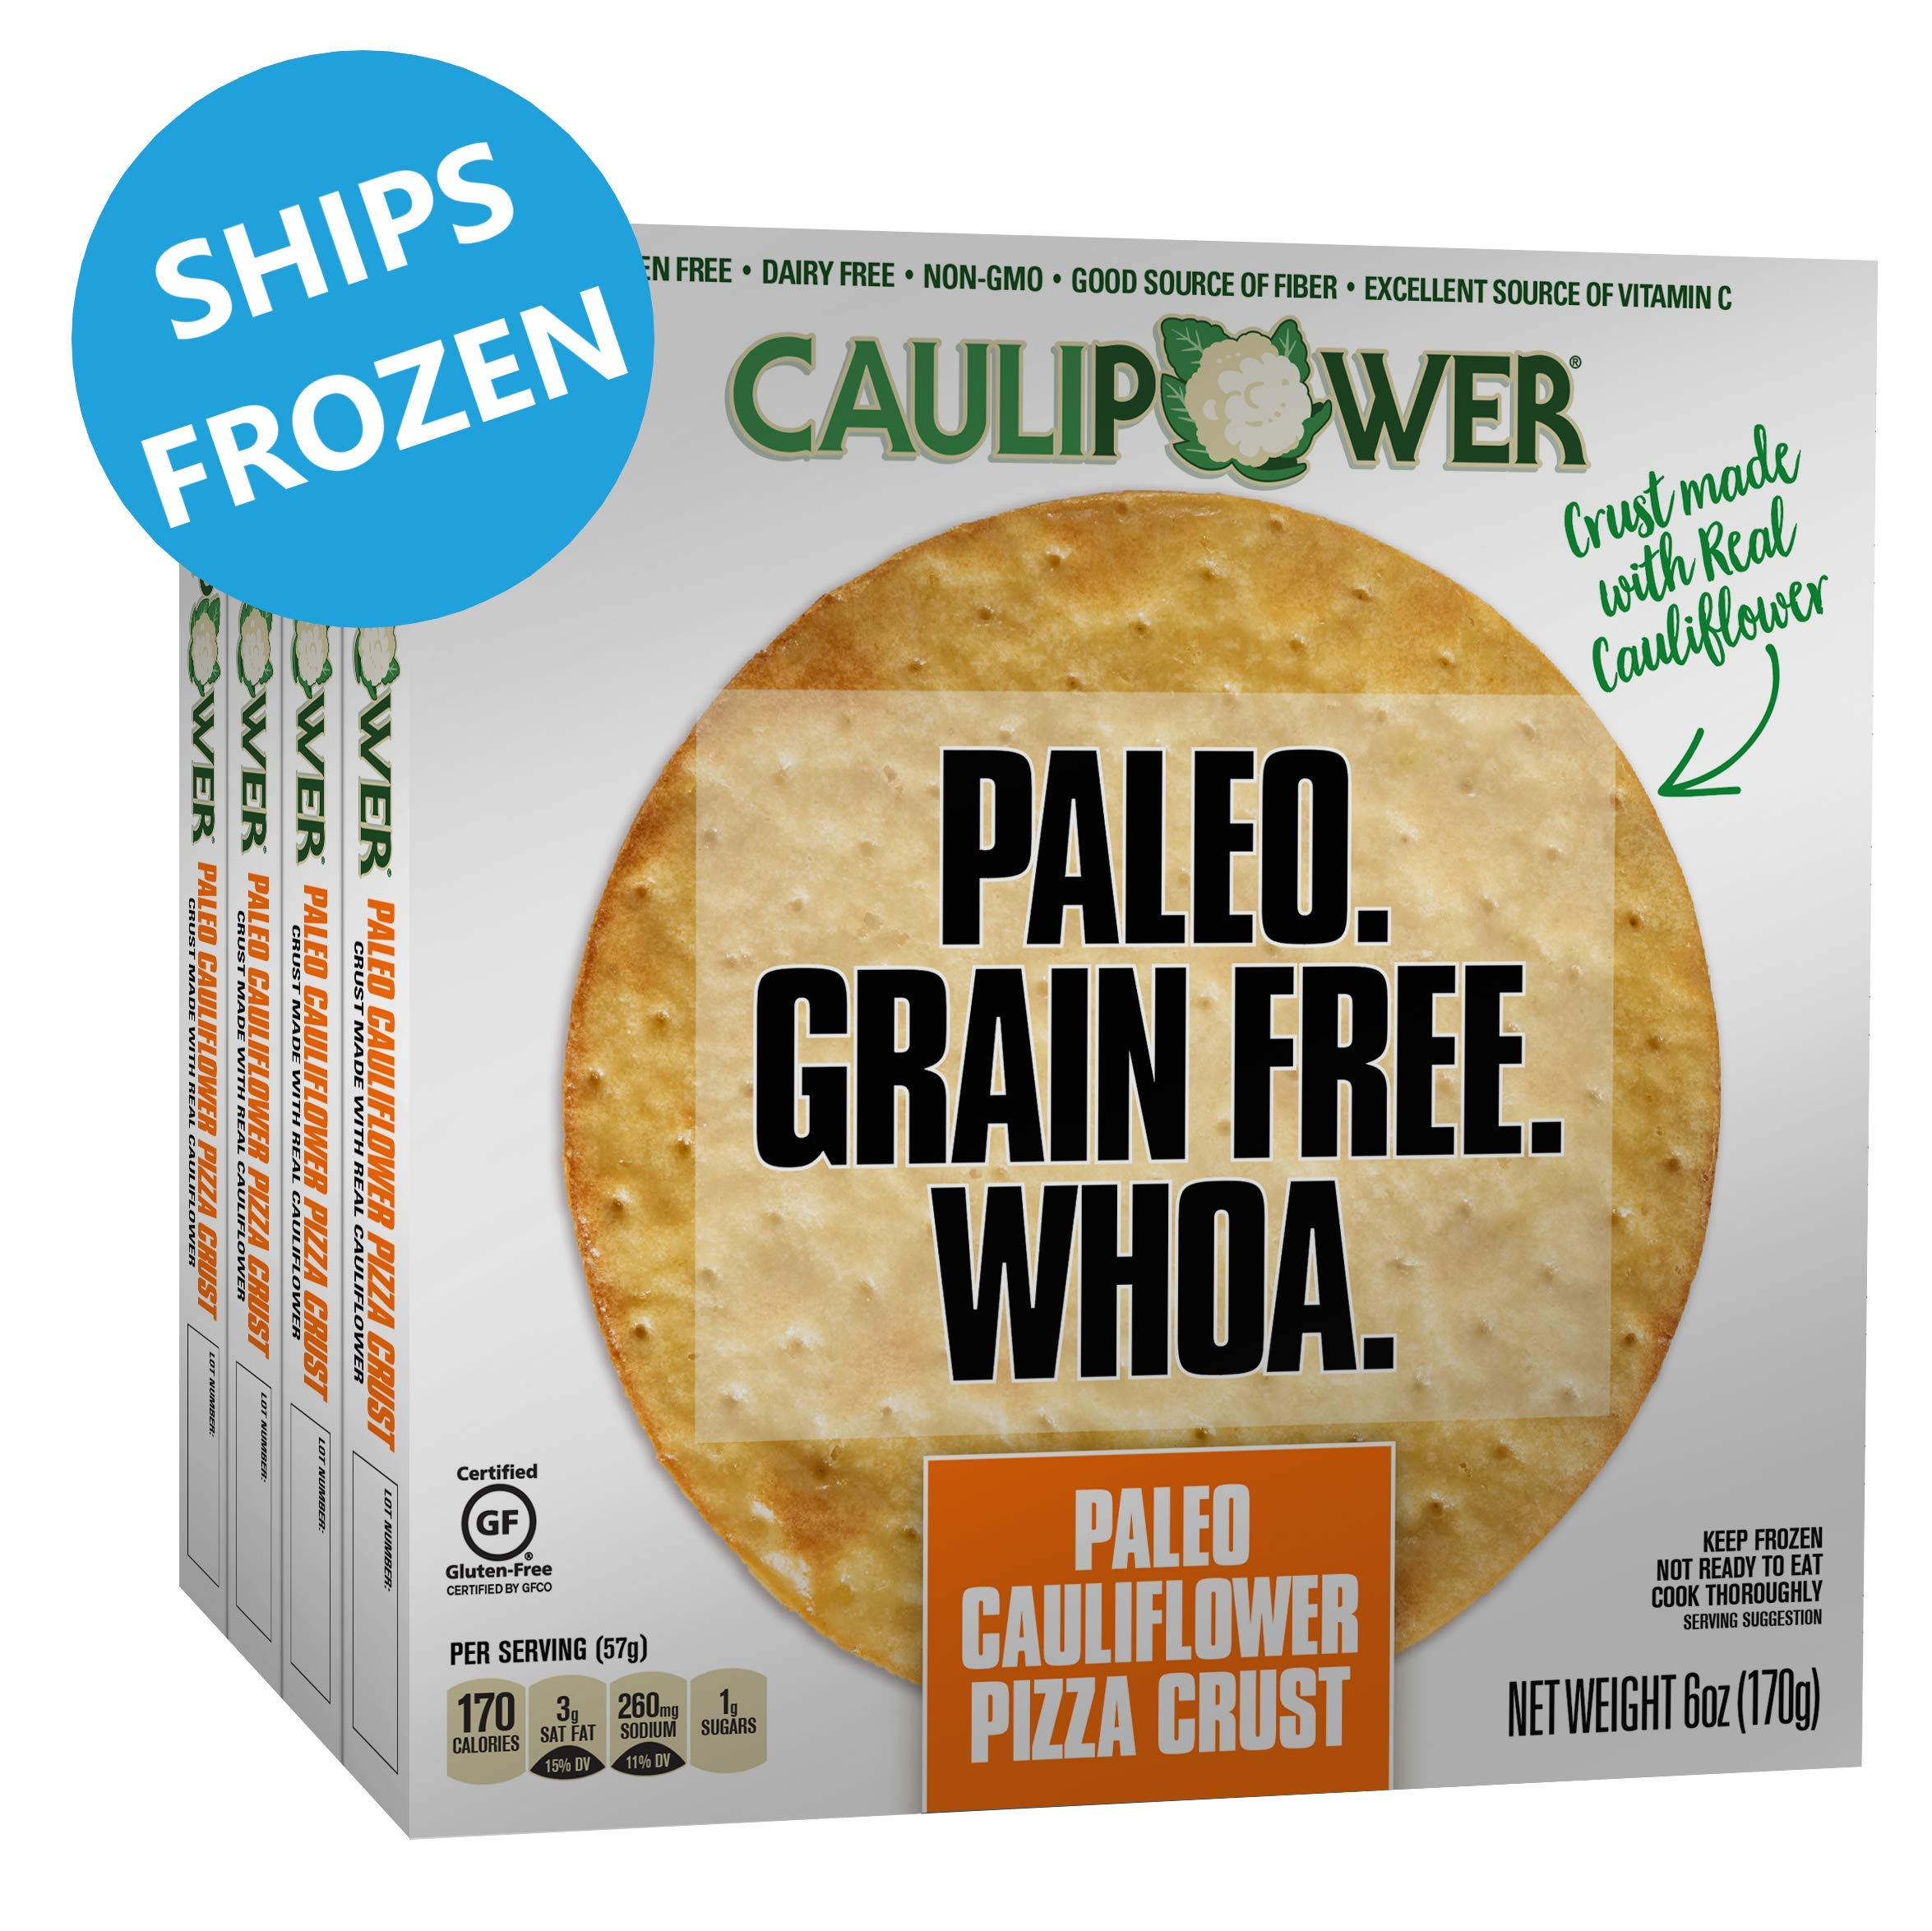 CAULIPOWER Paleo Cauliflower Pizza Crusts, Grain Free, Gluten Free, Non-Gmo, Lower Carb (4 Crusts) by CAULIPOWER